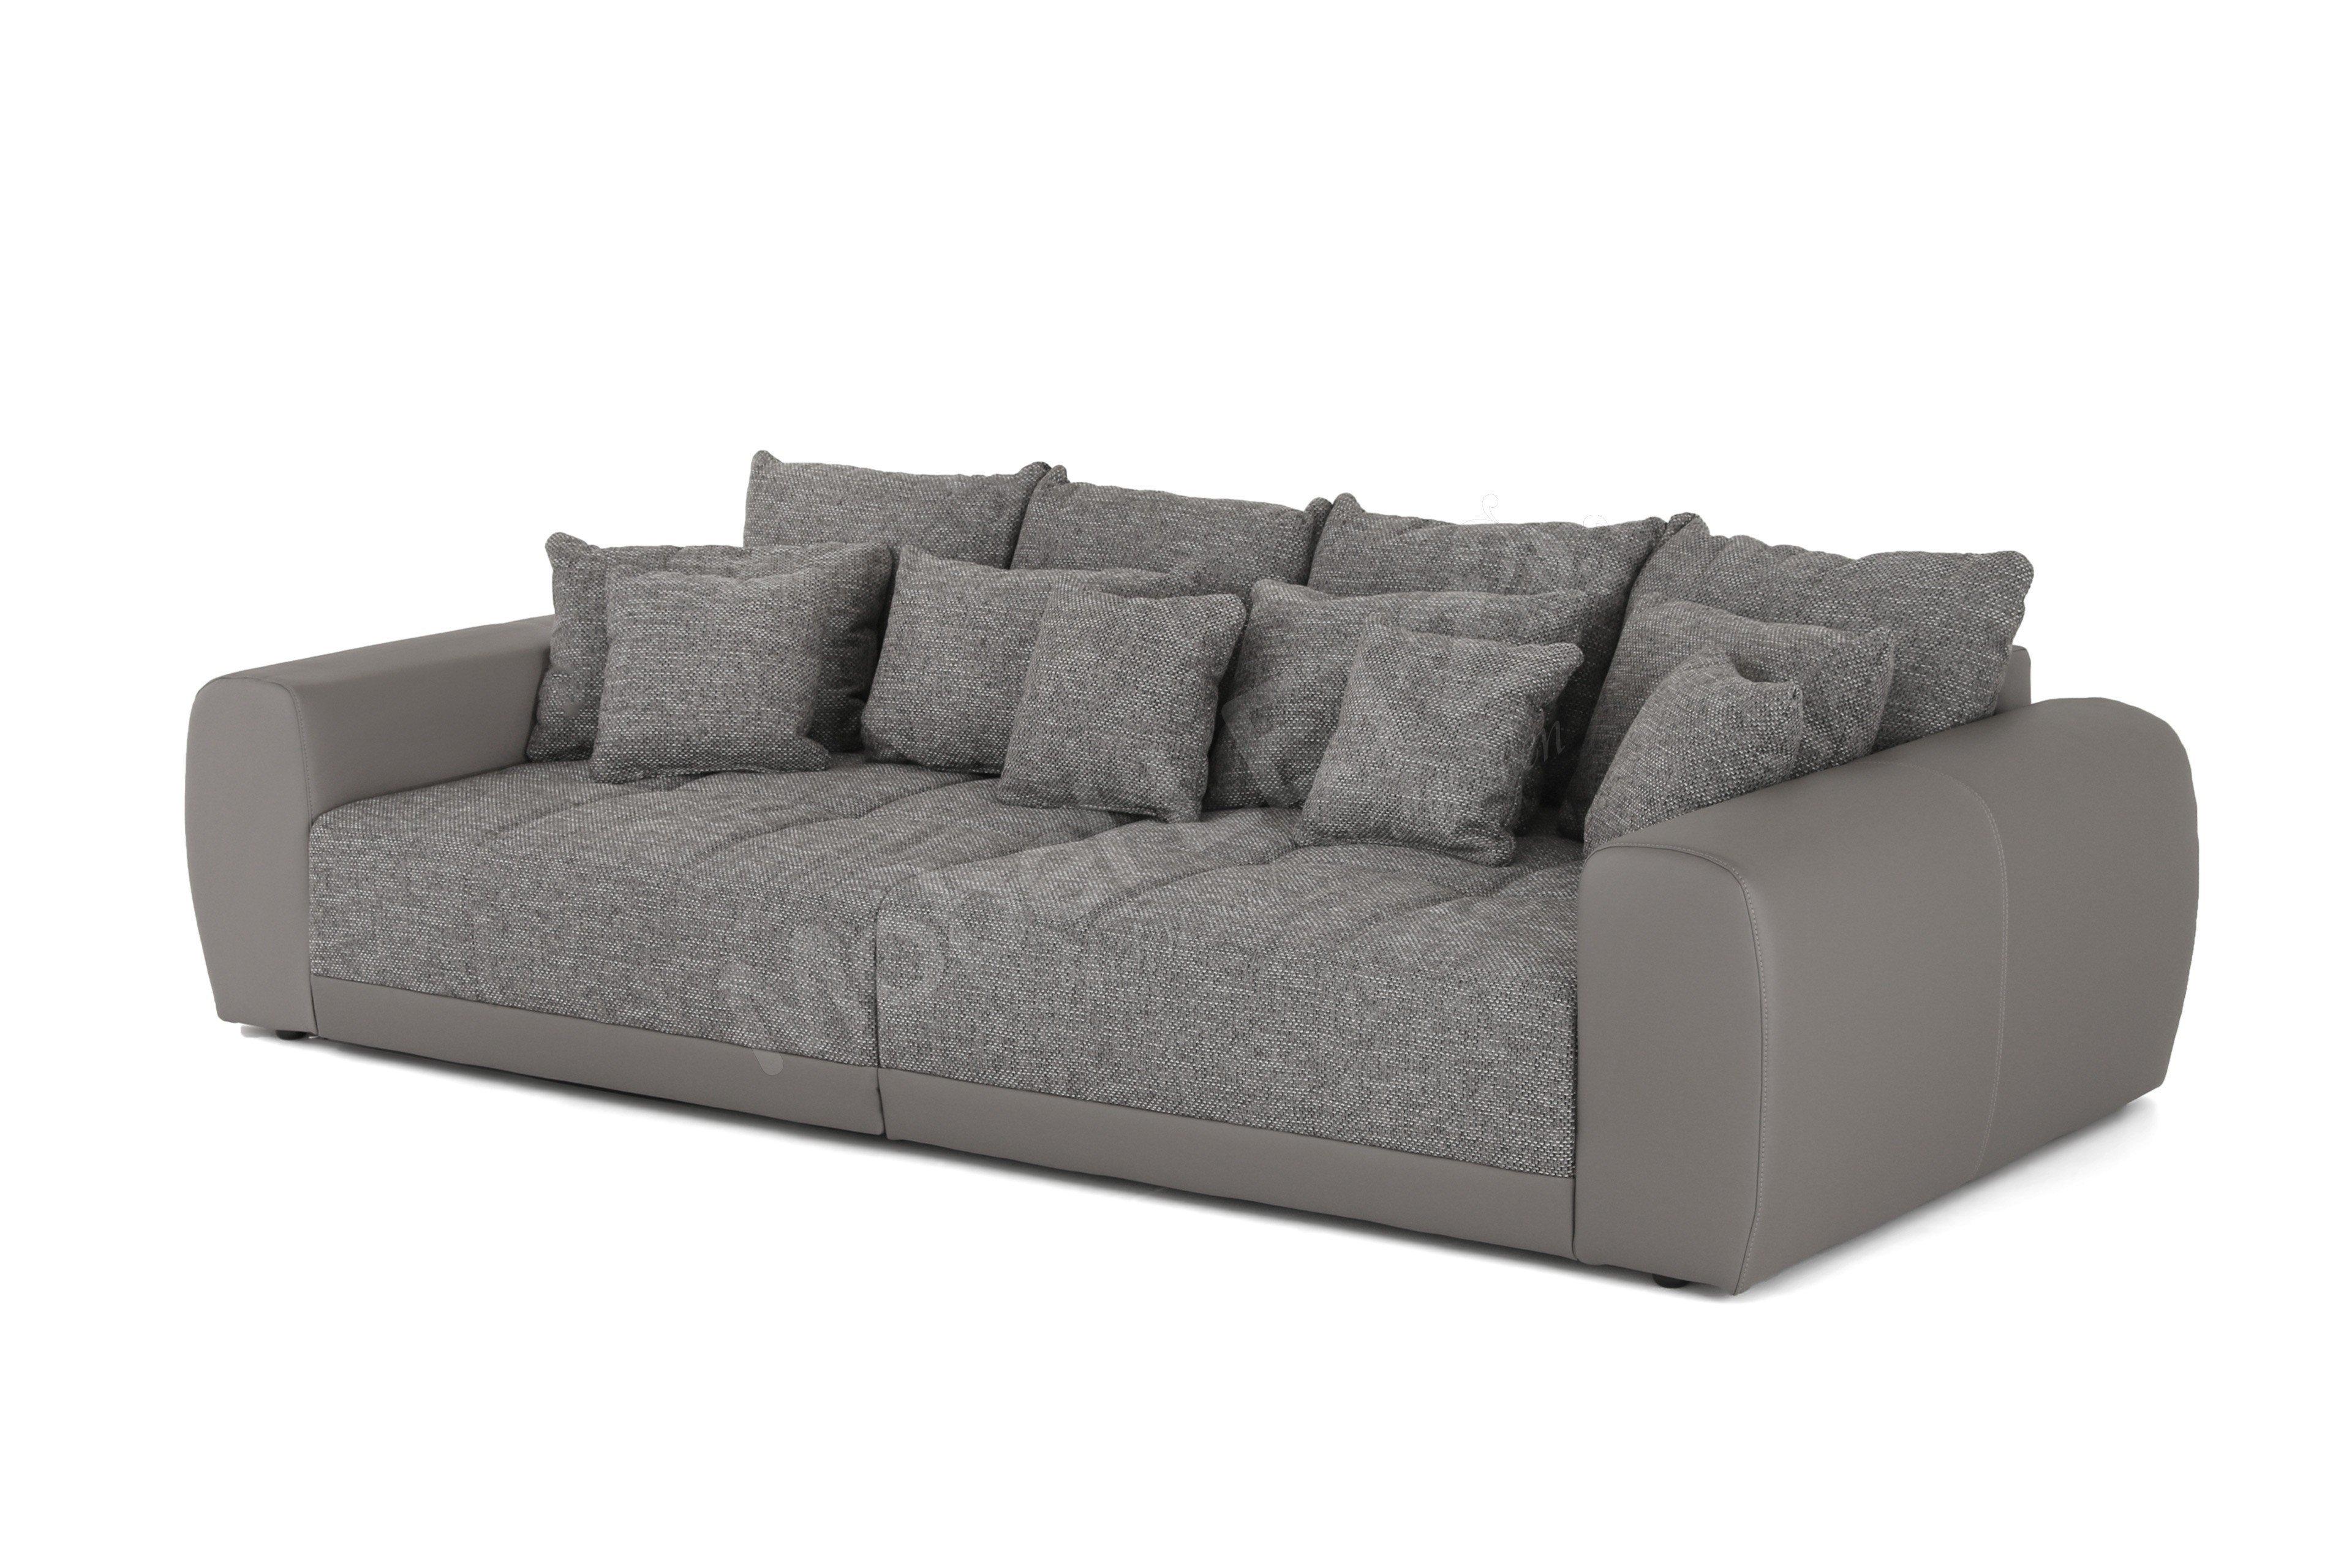 Kollektion Letz Big Sofa Natascha in grau | Möbel Letz - Ihr ...